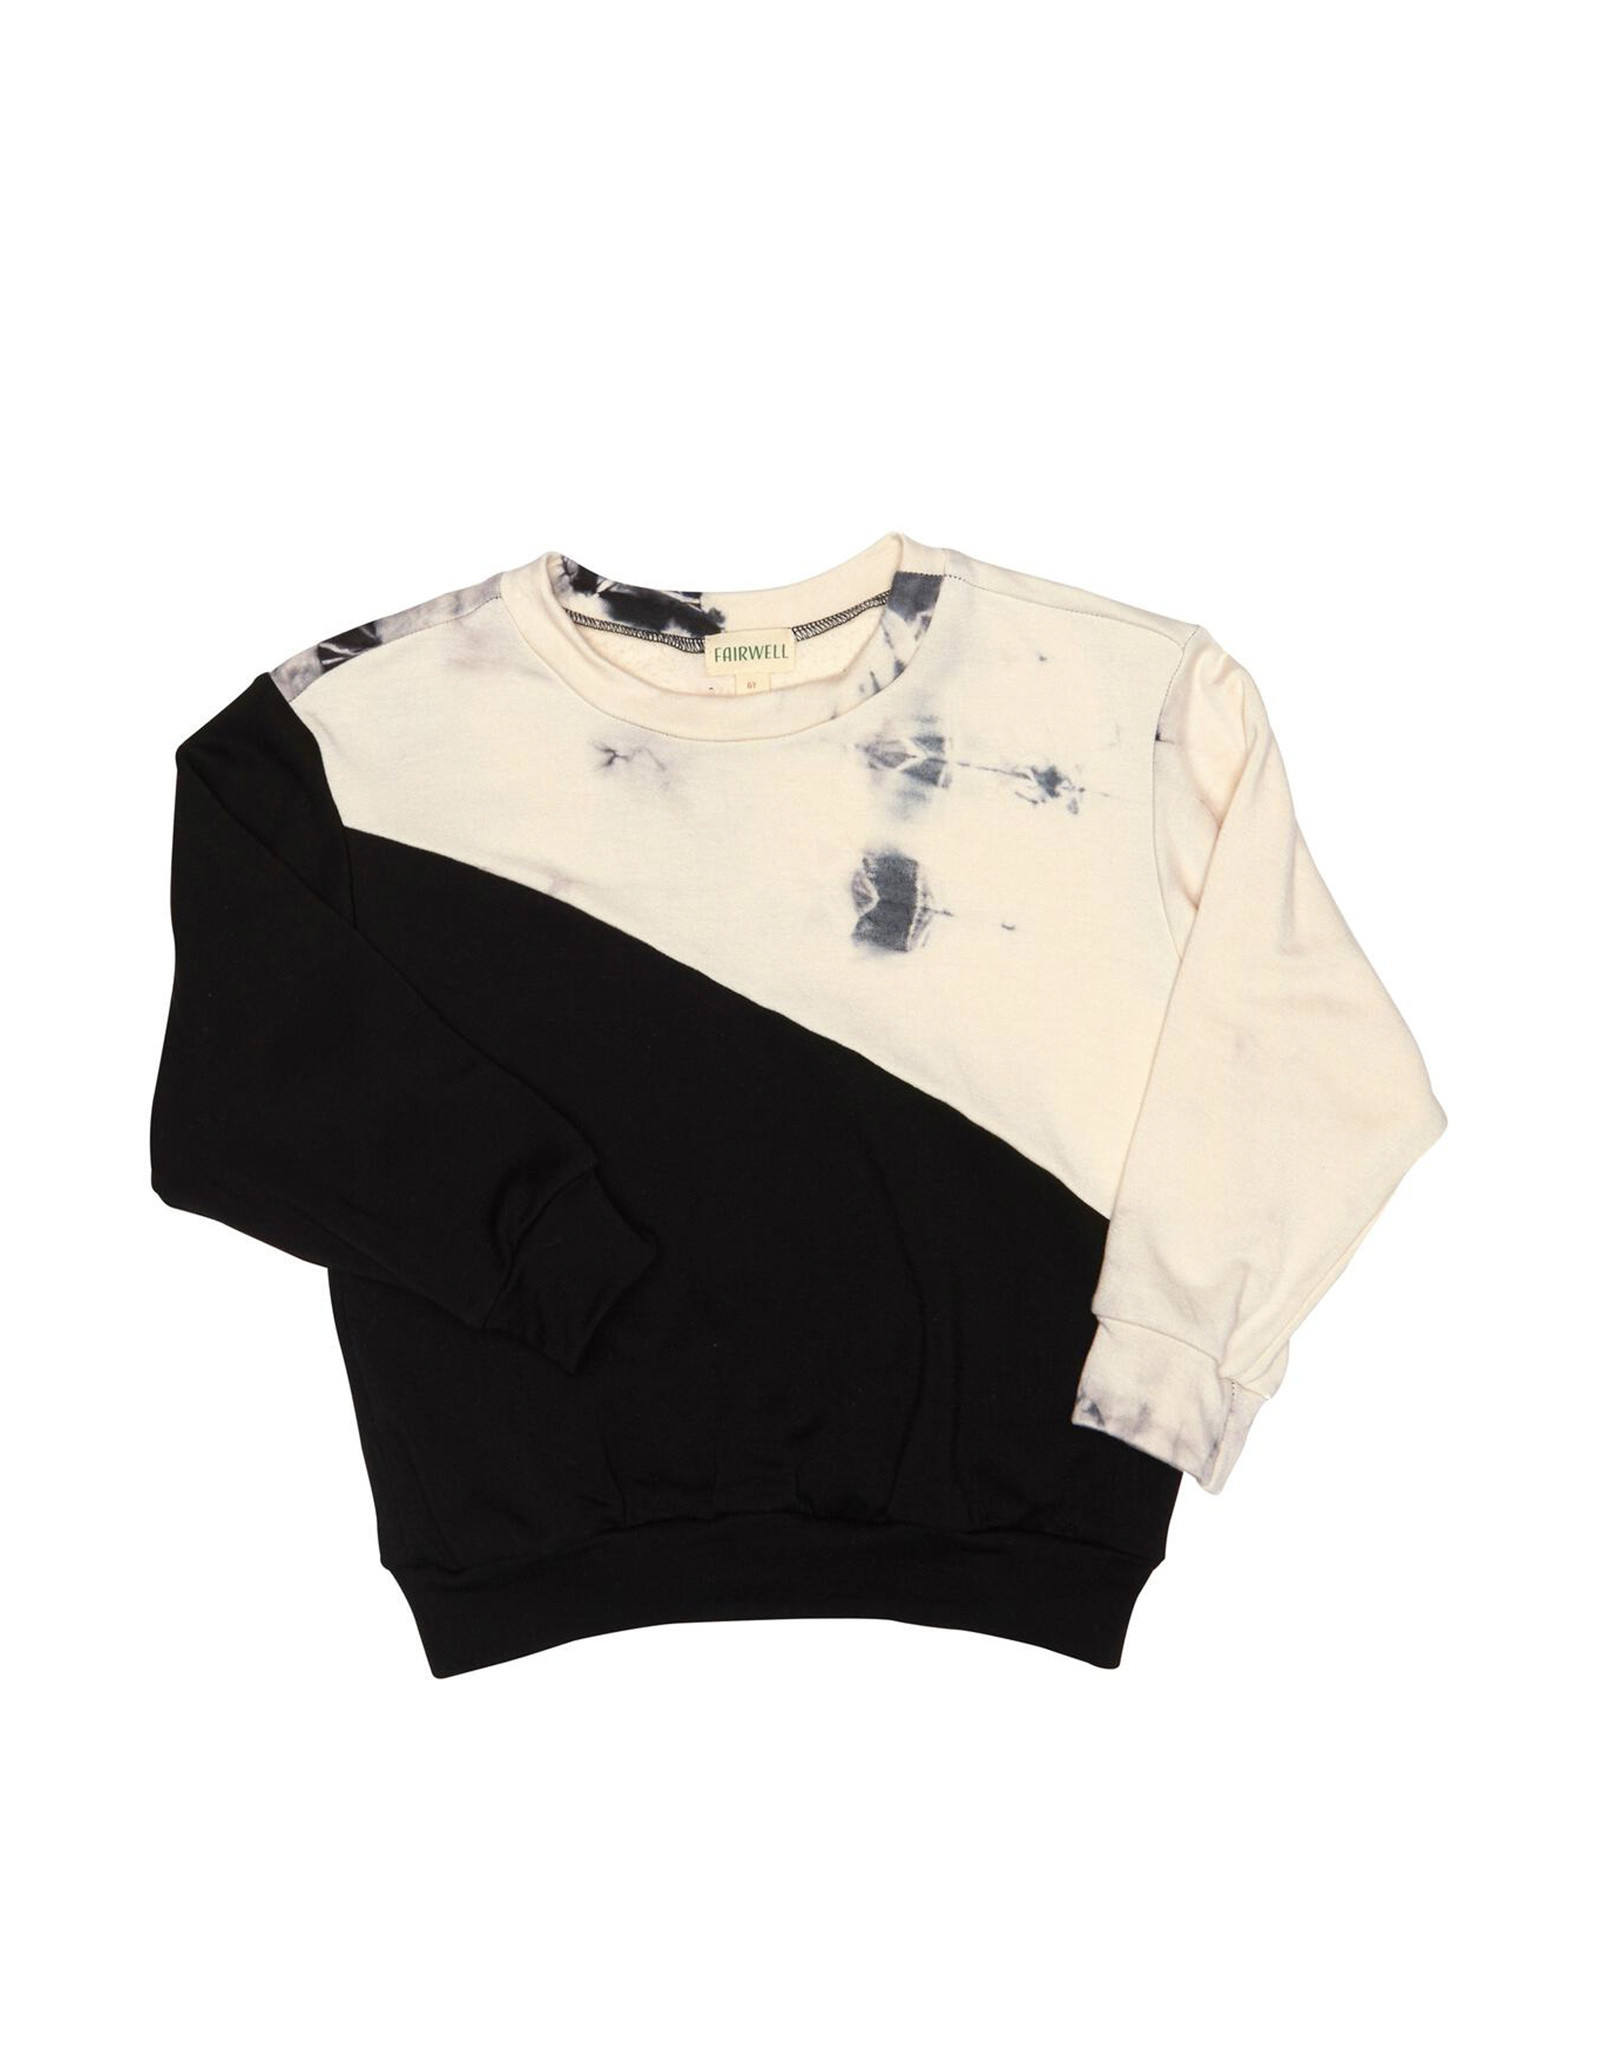 Fairwell Ecru & Black Block Pullover